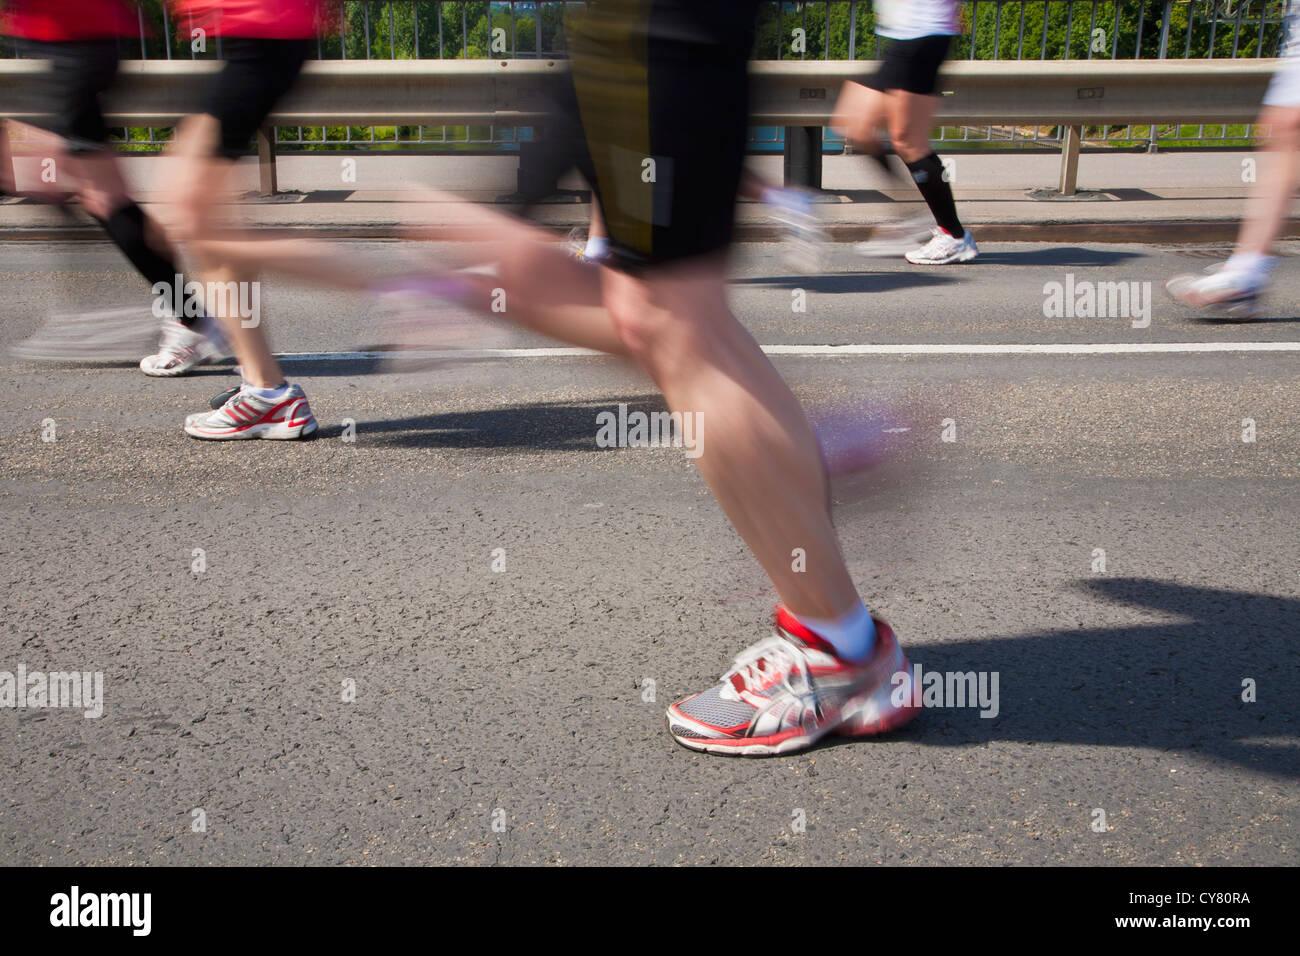 MARATHON RUNNERS, MARATHON IN STUTTGART, BADEN-WURTTEMBERG, GERMANY - Stock Image